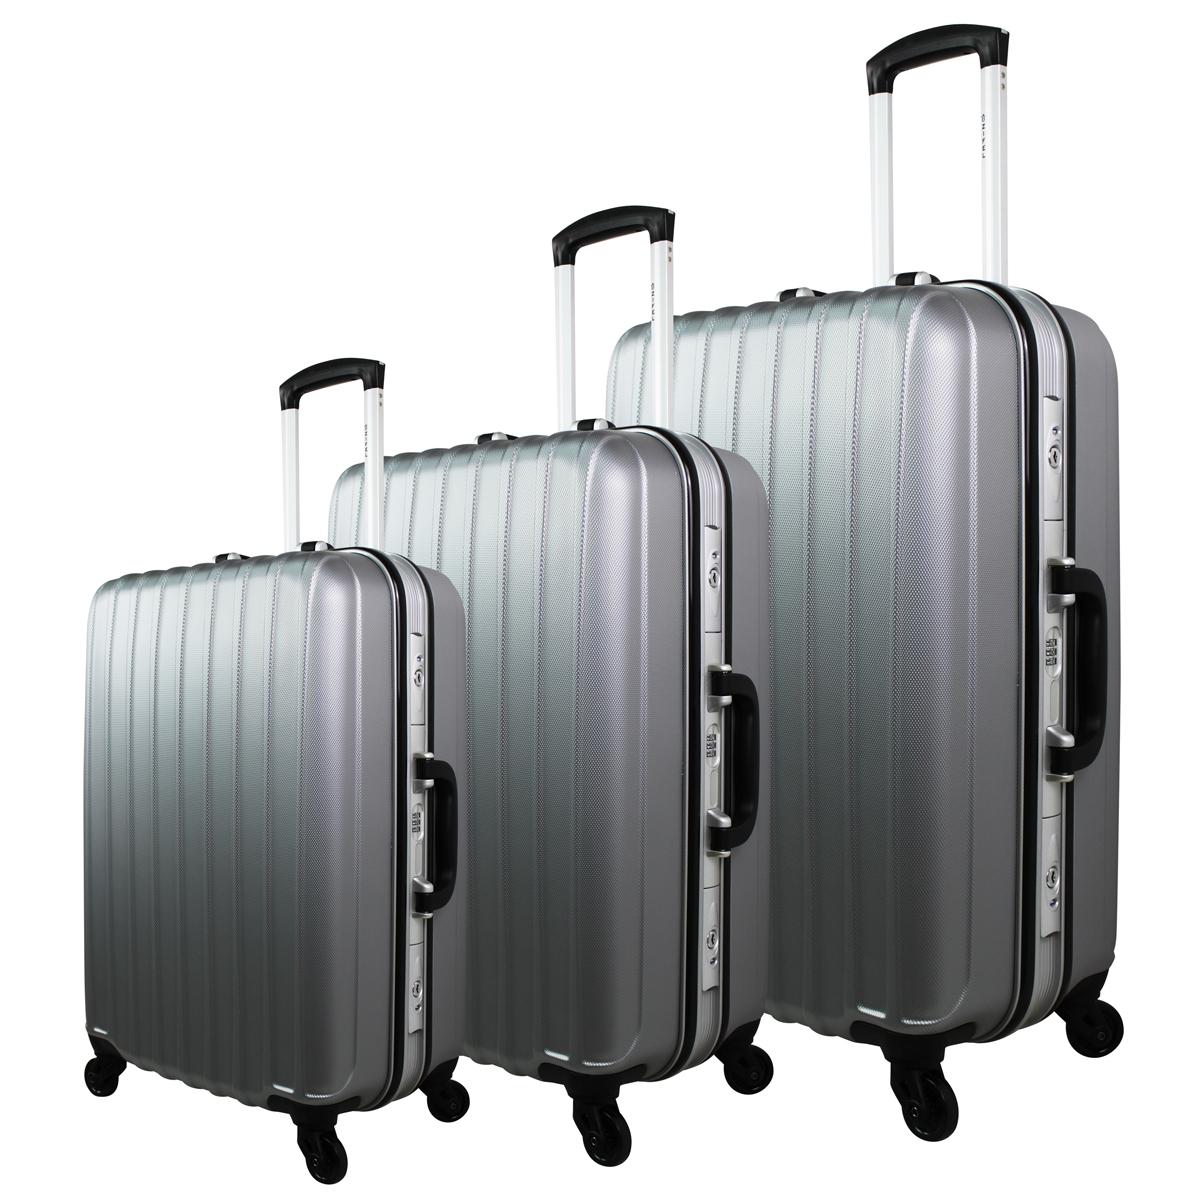 lot de 3 valises rigides pas cher bagage solide. Black Bedroom Furniture Sets. Home Design Ideas